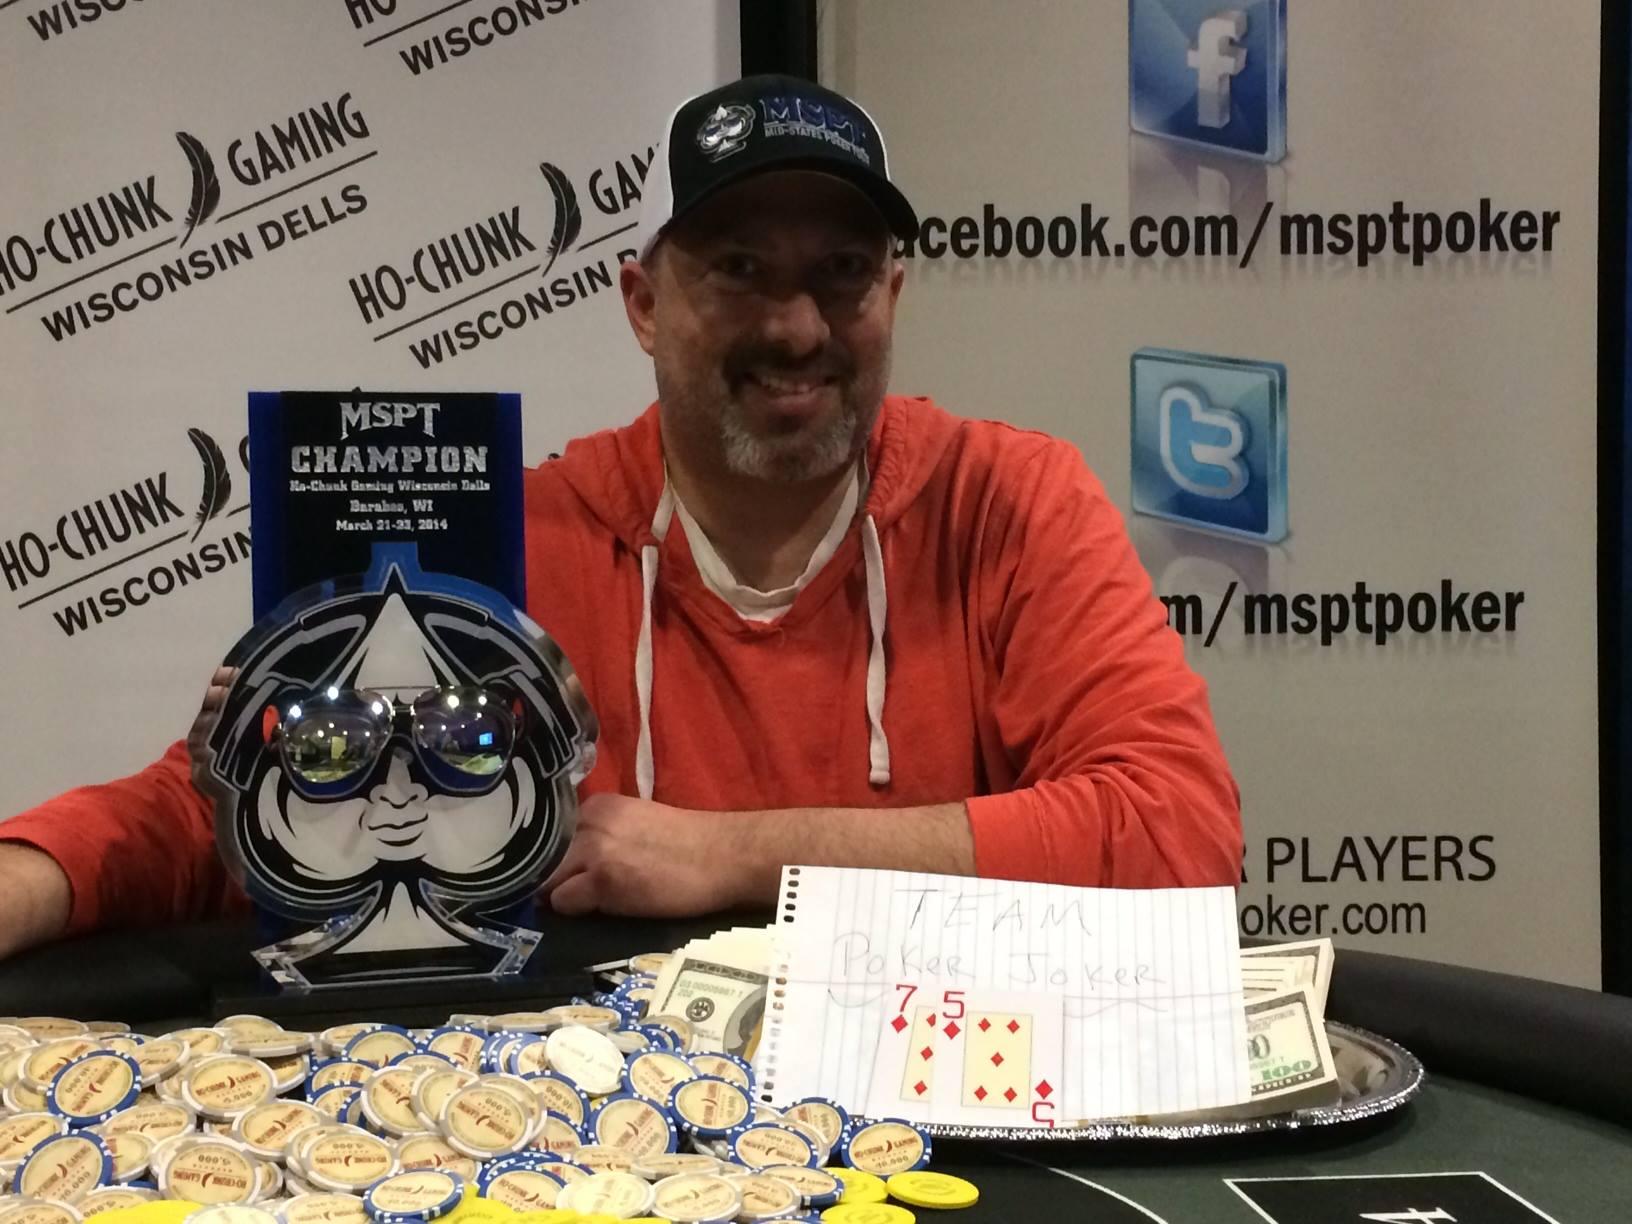 Ho chunk casino wisconsin dells winners - Advanced poker strategy quiz